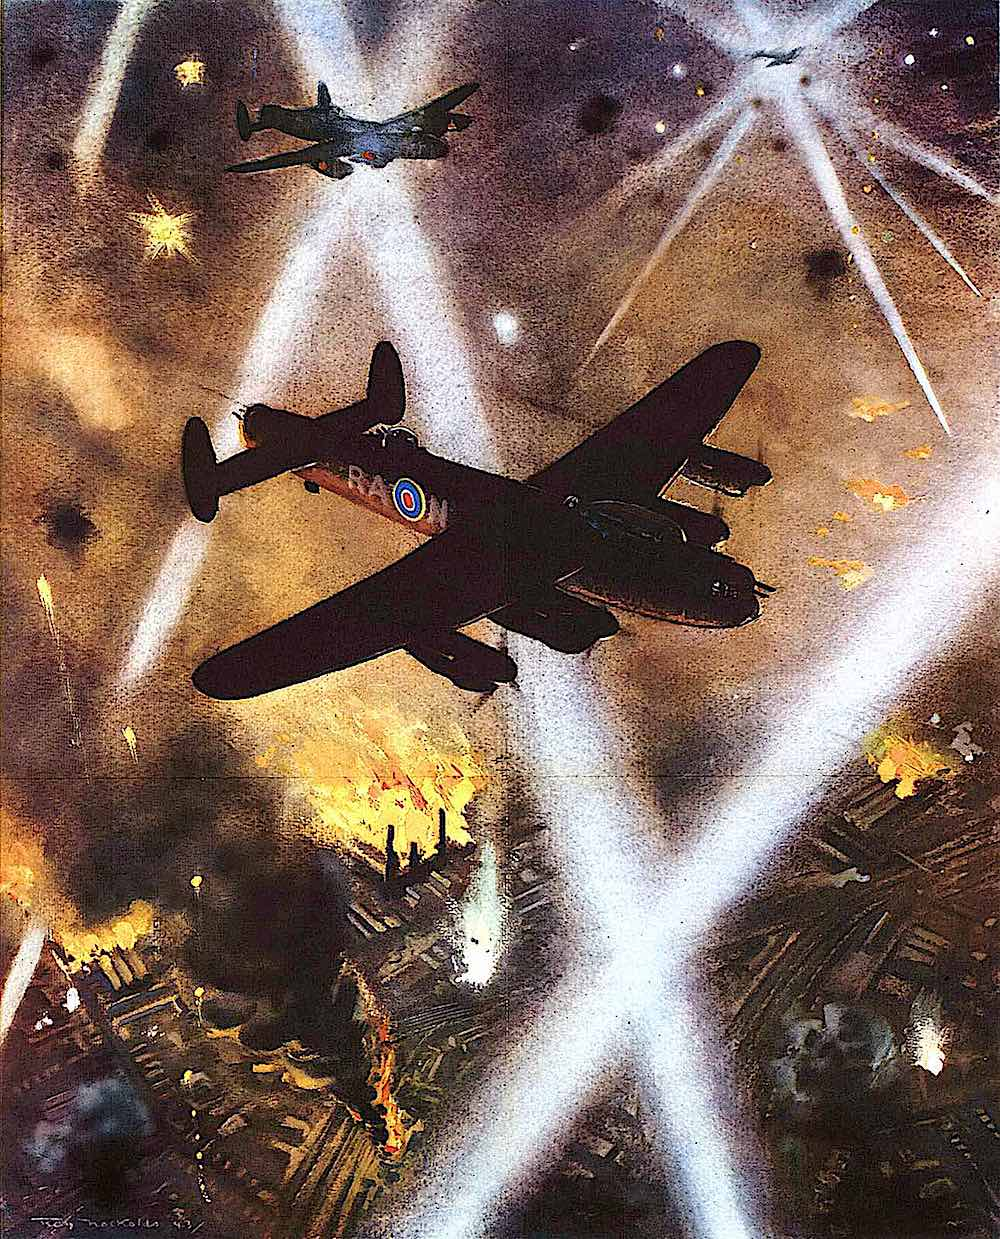 a Roy Nockolds illustration of a war bomber over a burning city